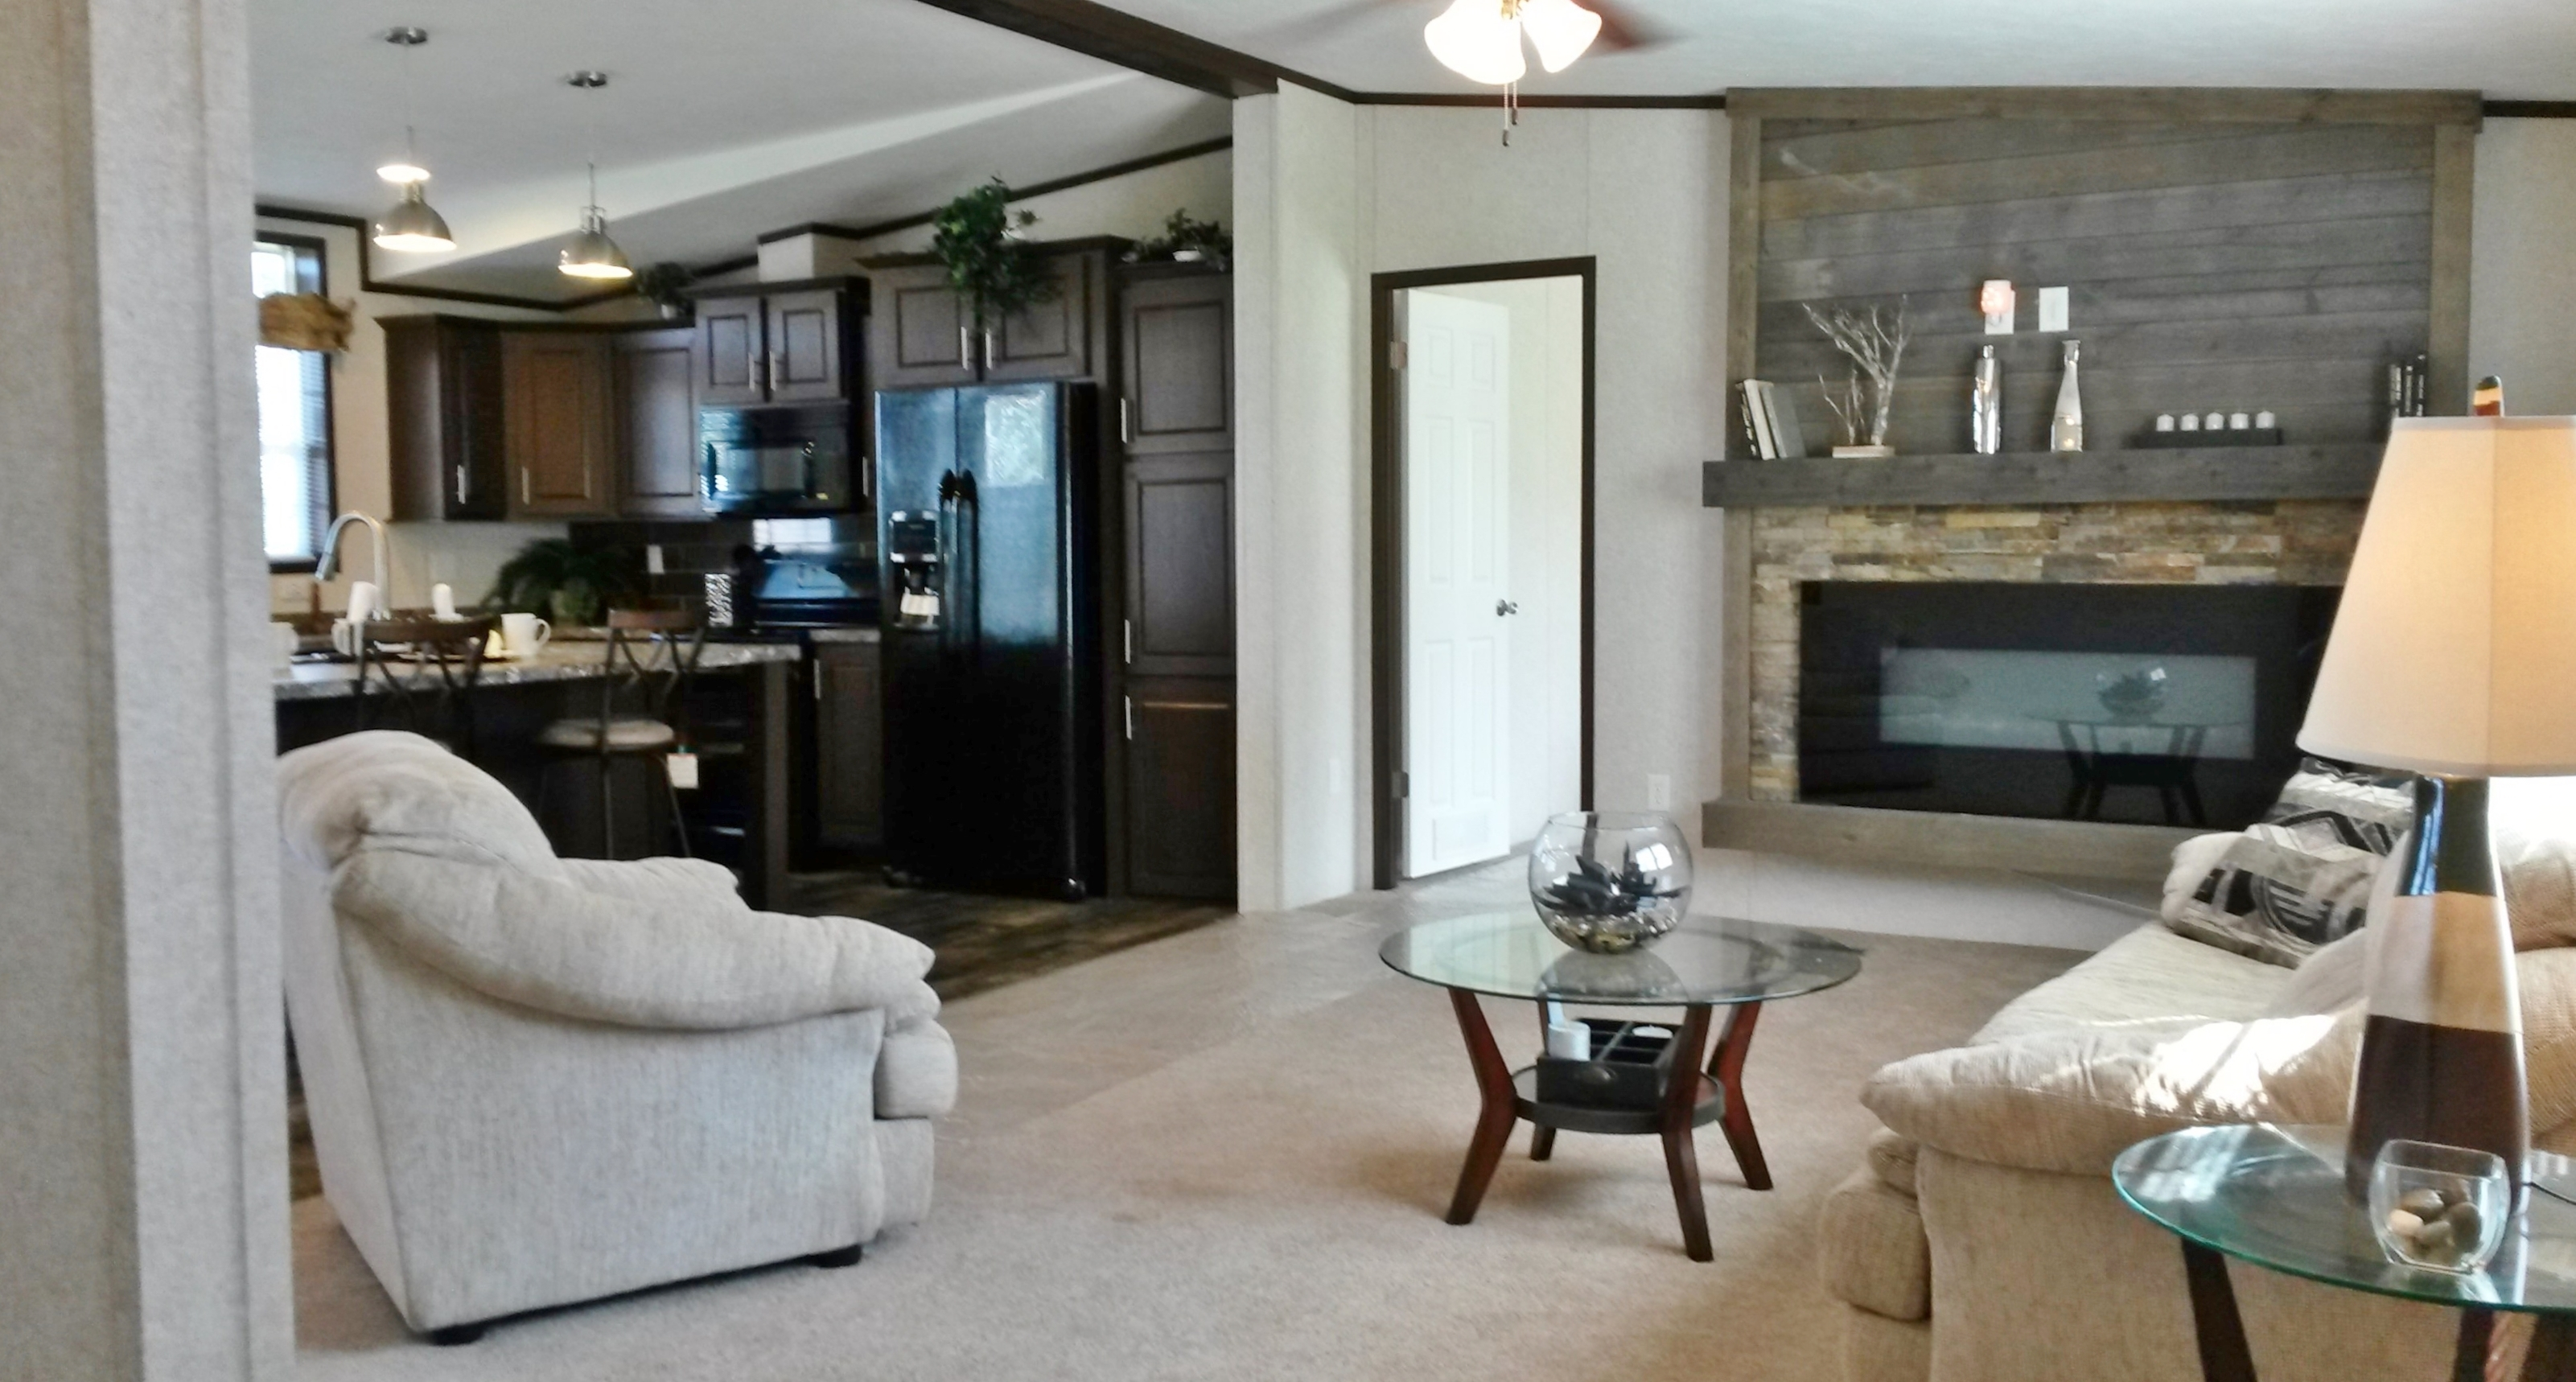 LED fireplace with stone surround